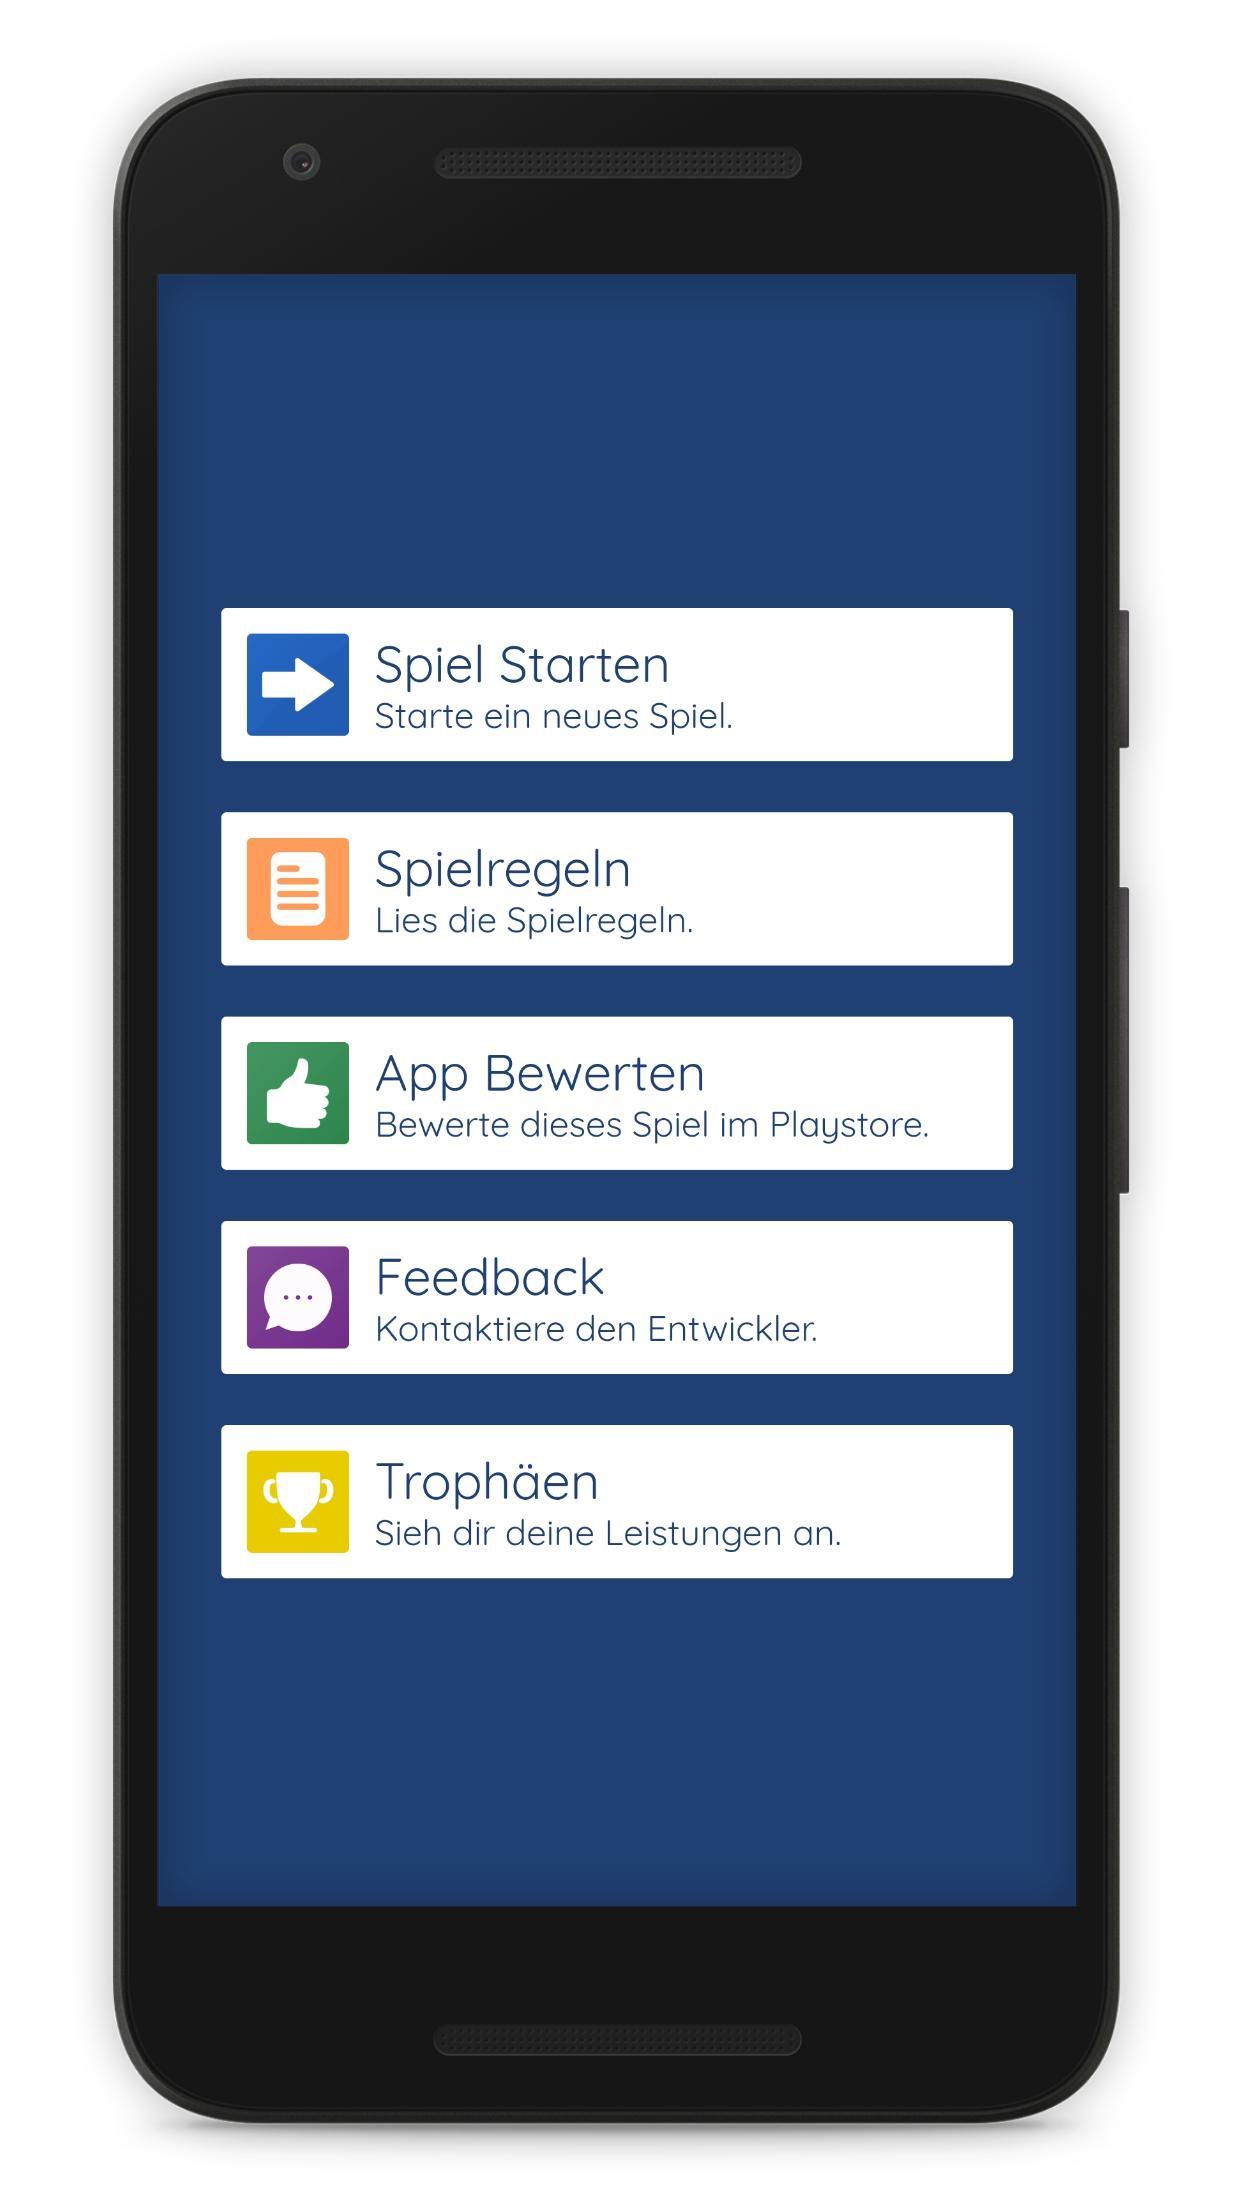 Voll - Das Trinkspiel for Android - APK Download